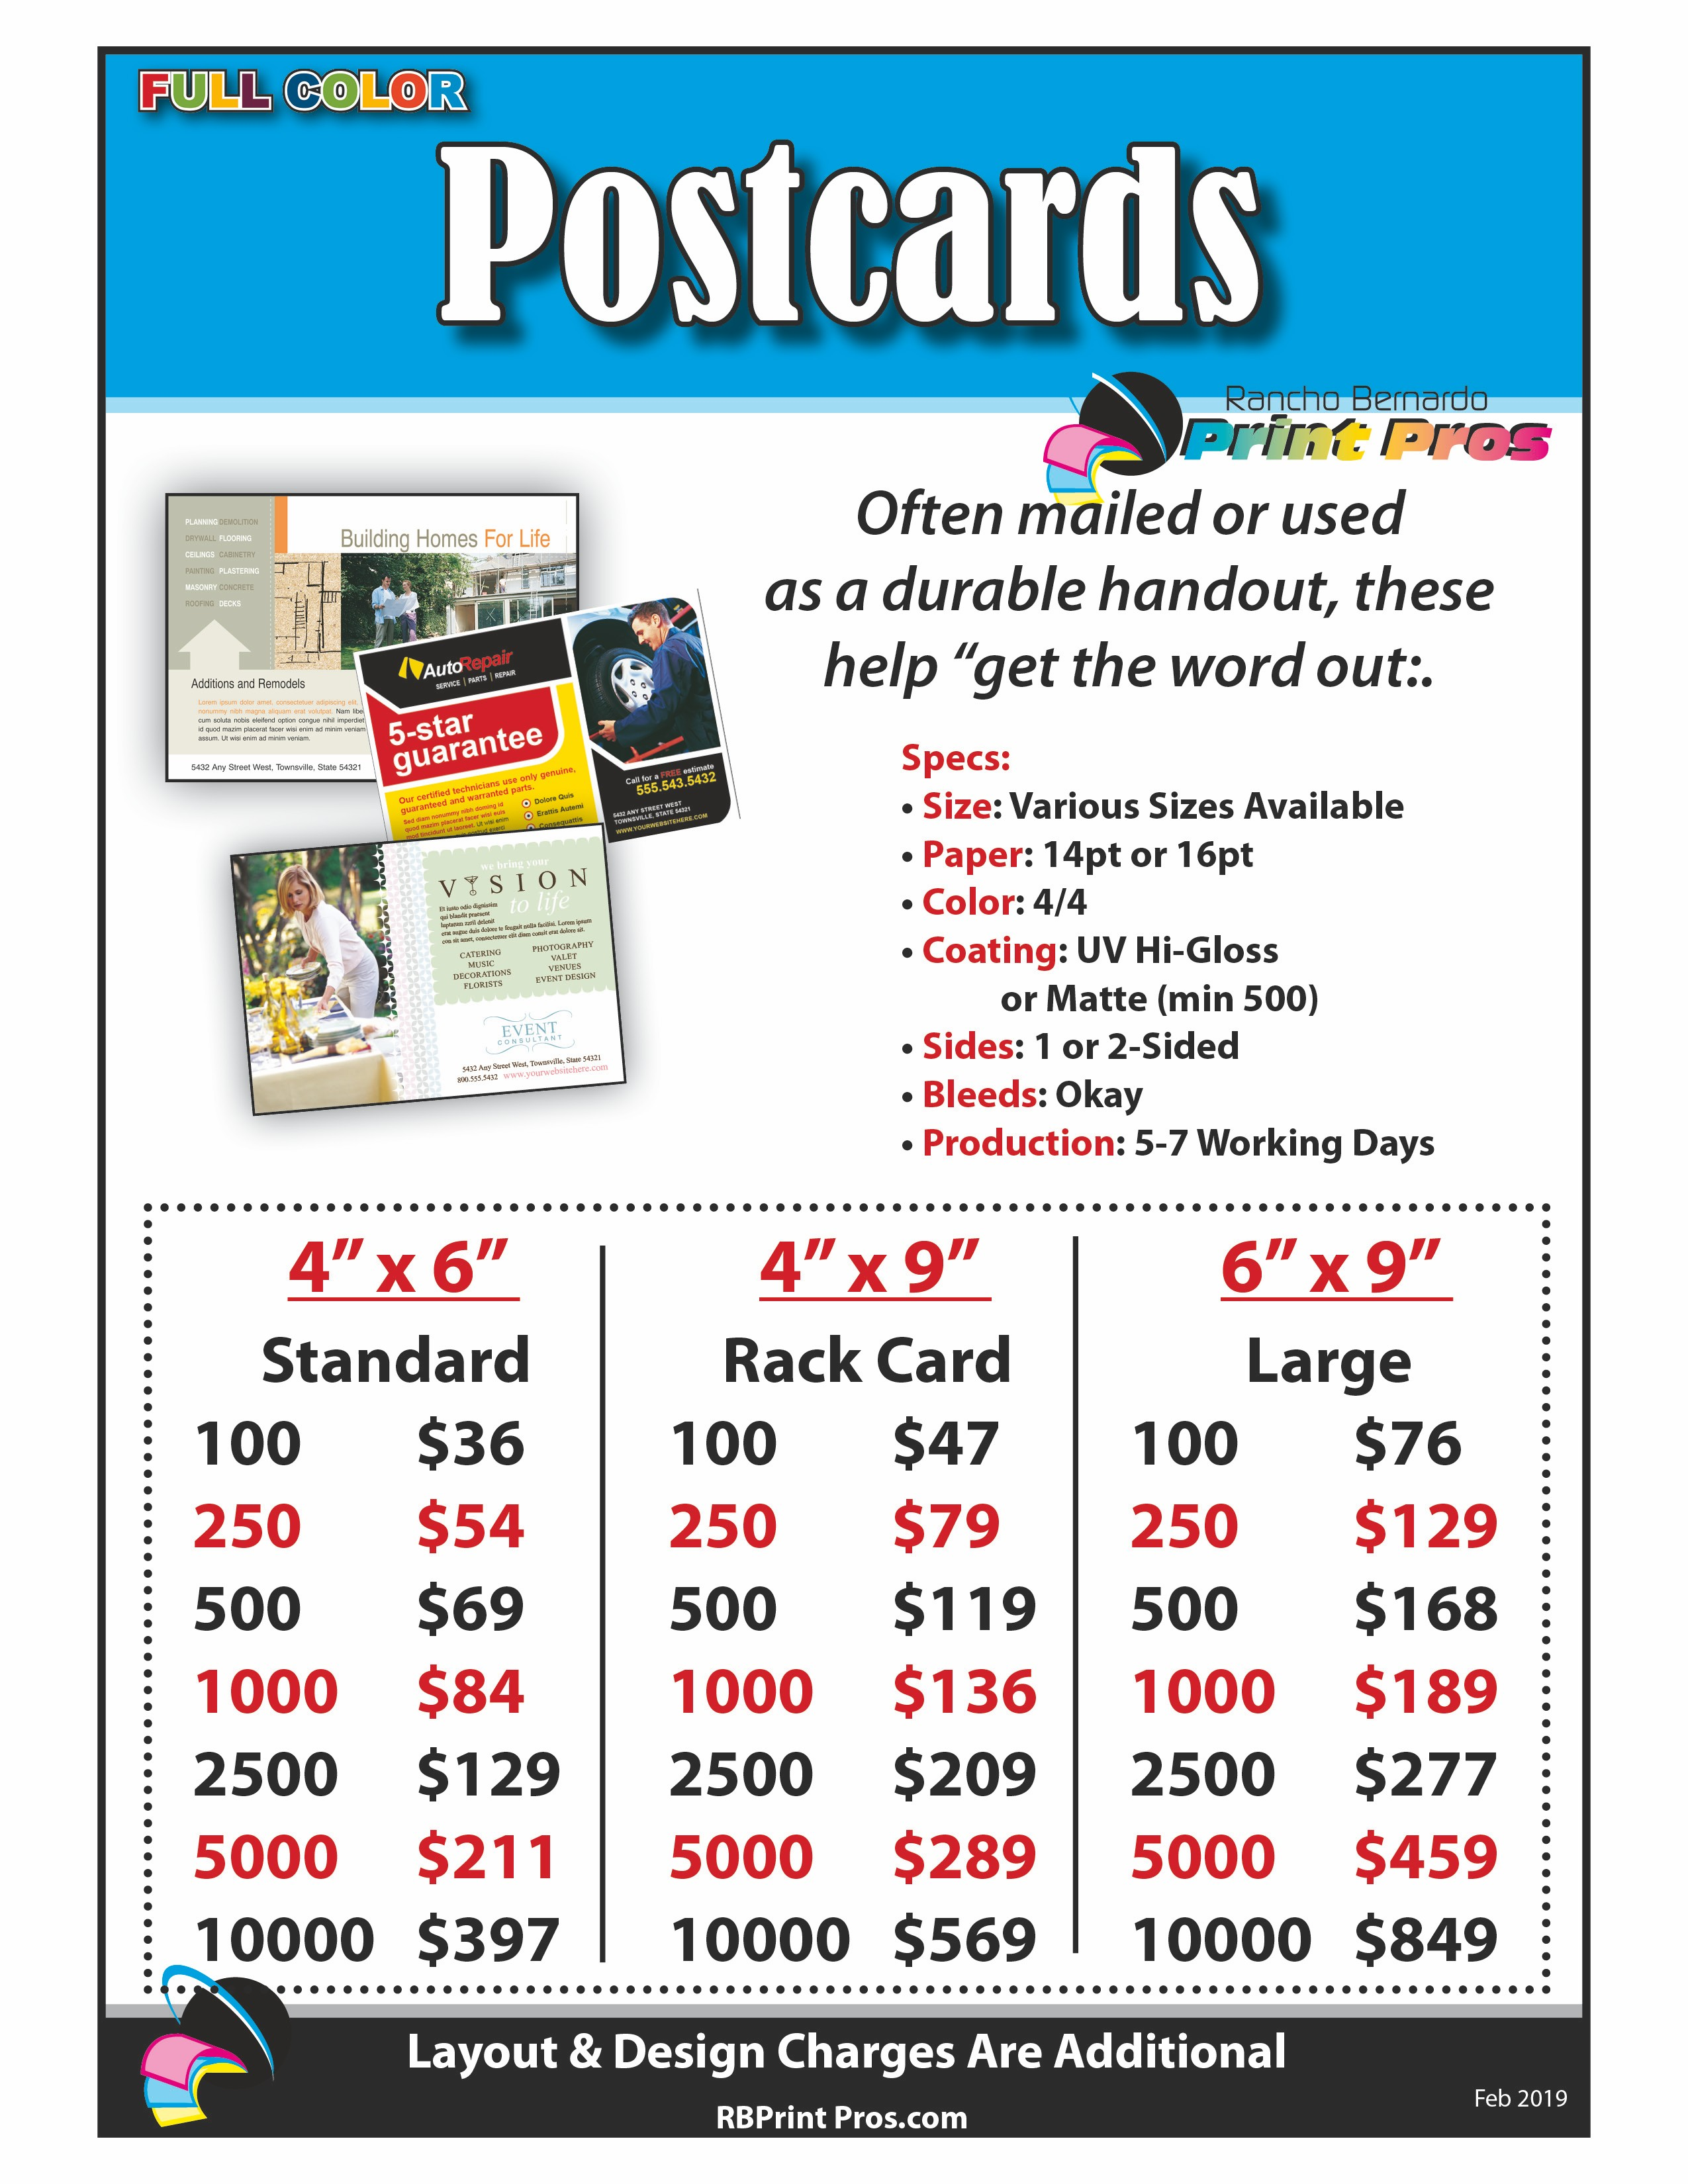 rbpp_4c.postcards.3.6.19.hi300.jpg